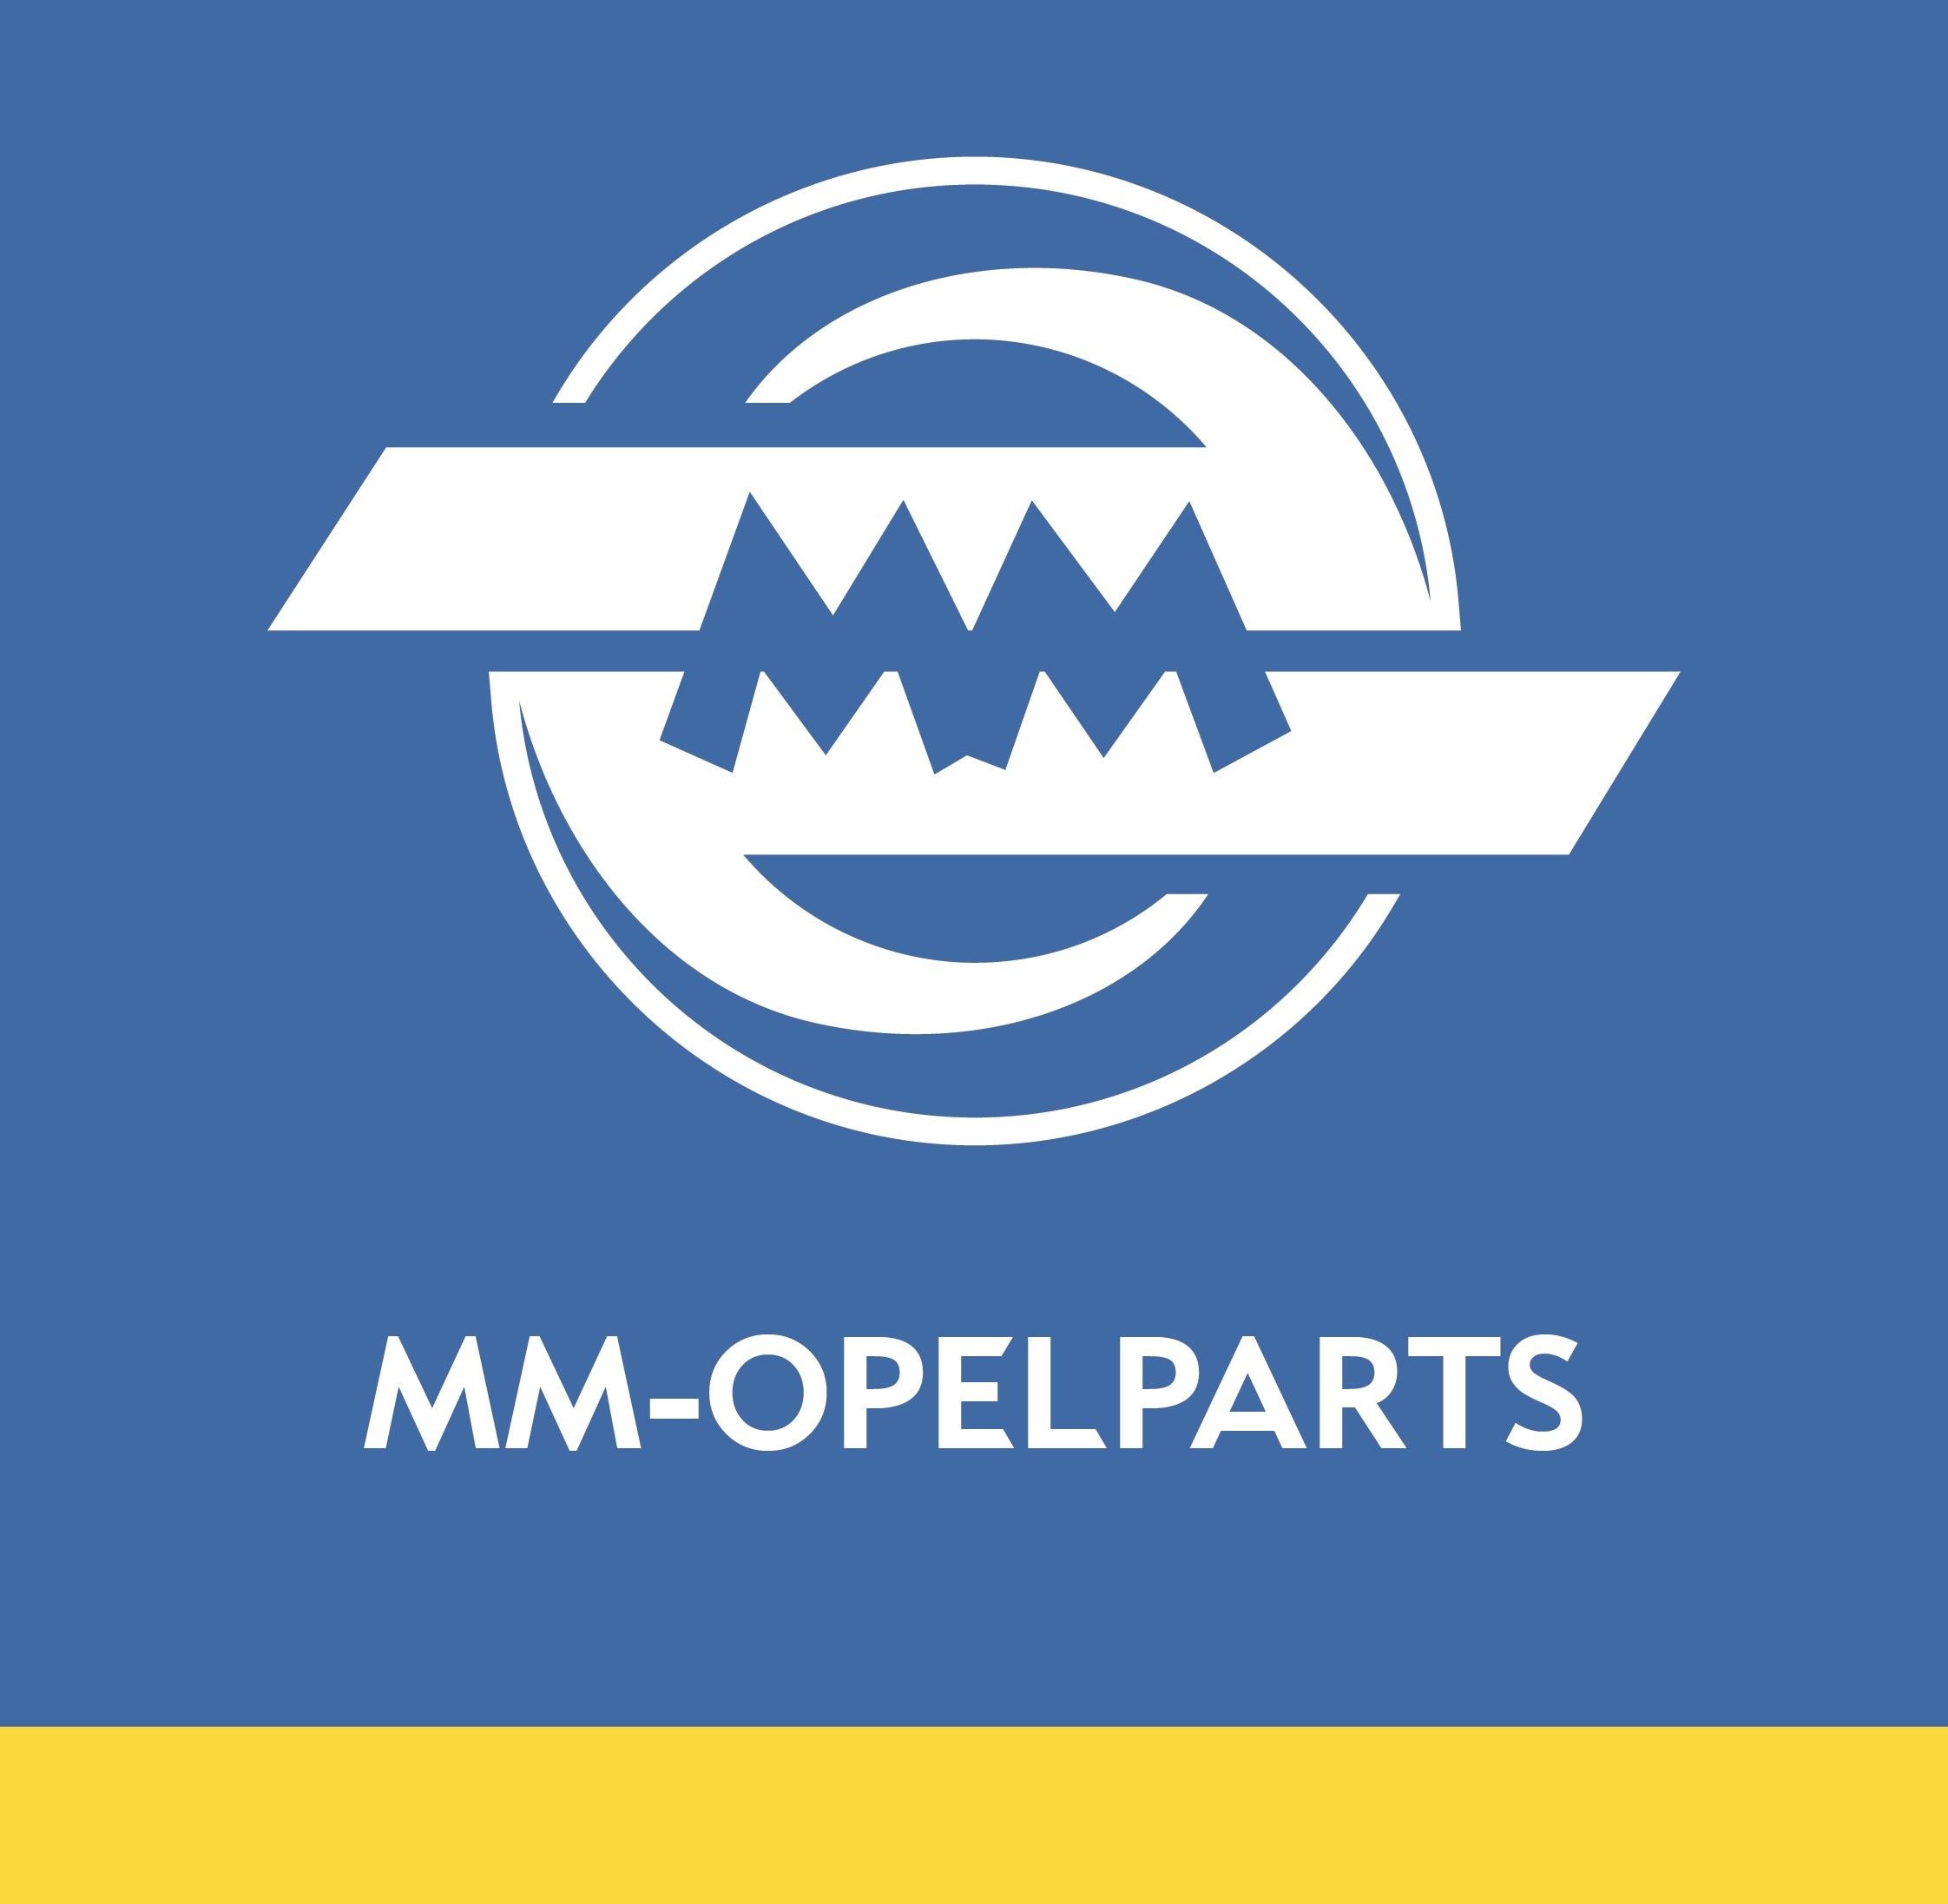 mm-opelparts